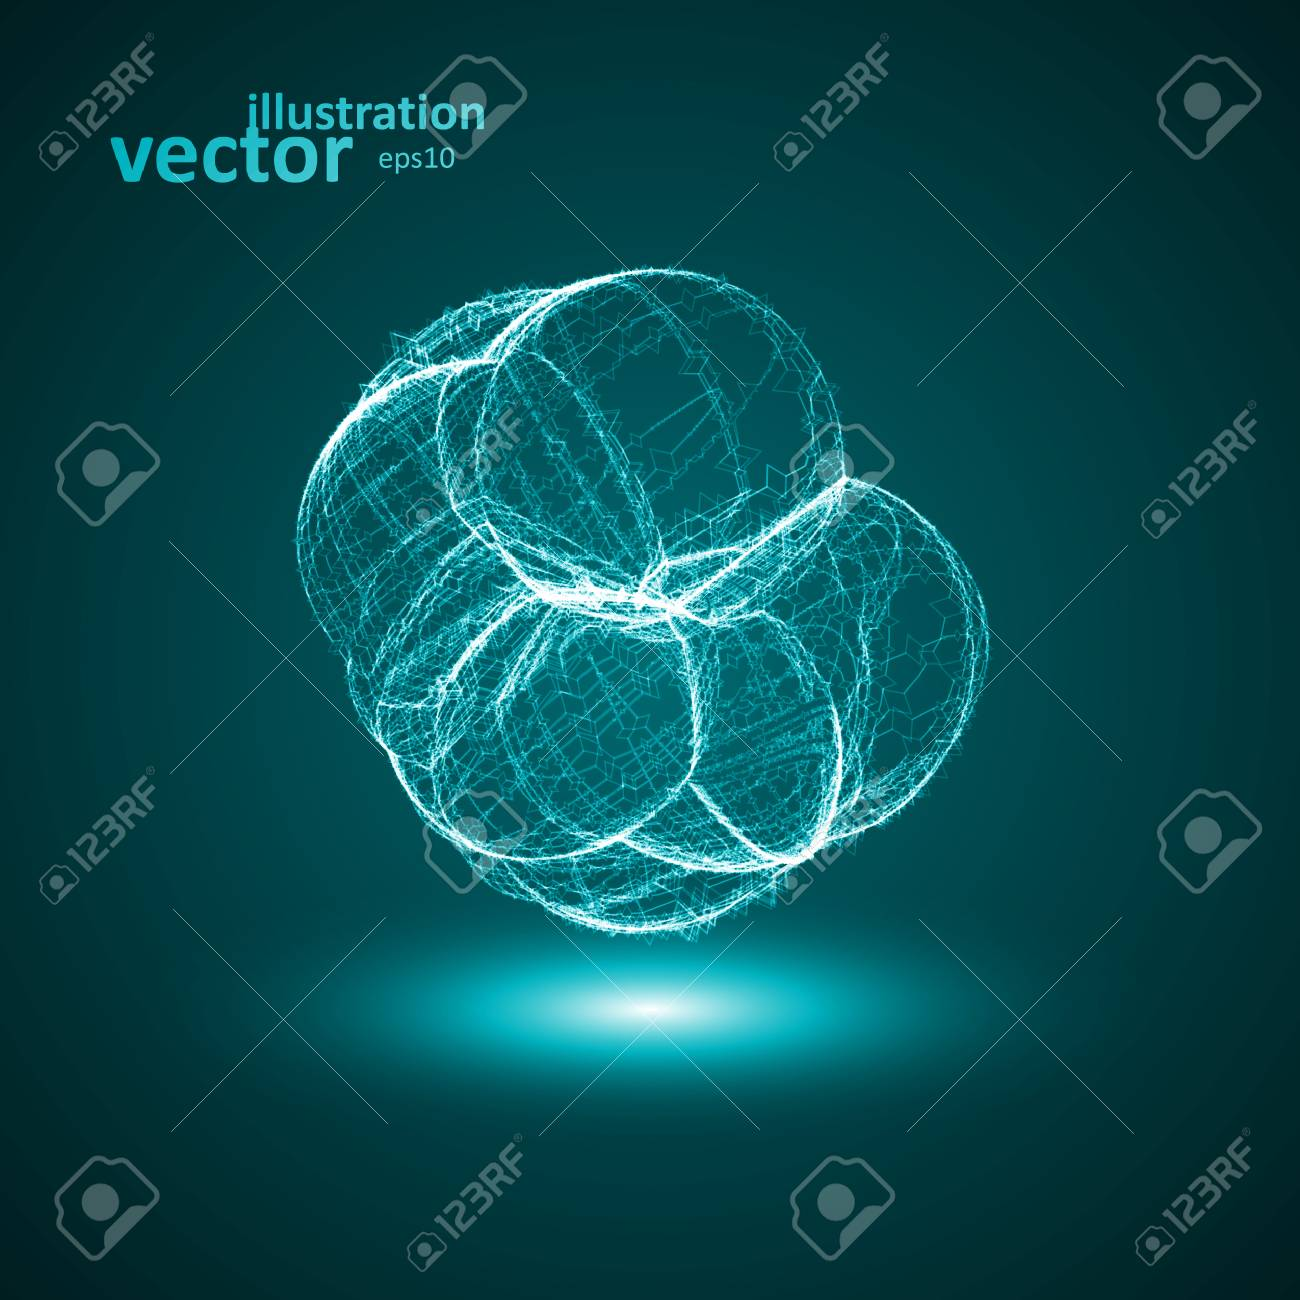 Futuristic illustration - conceptual virus, abstract shape eps10 Stock Vector - 25571656